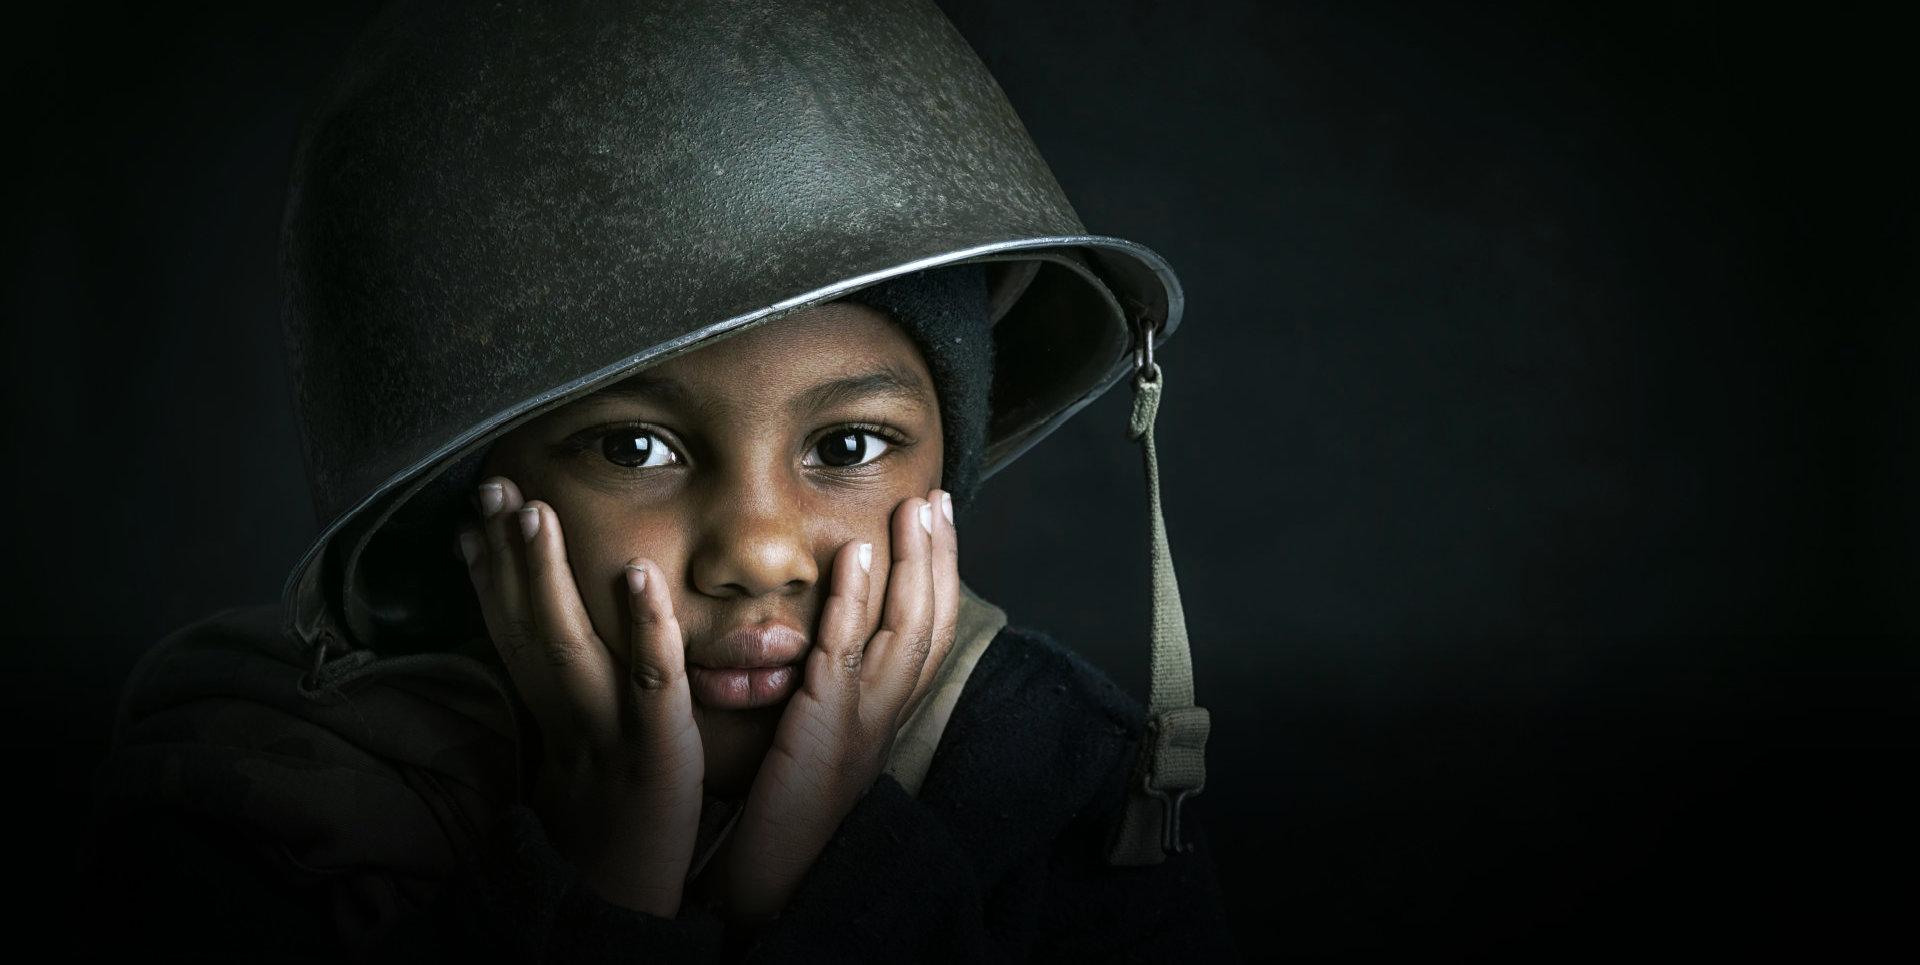 kid wearing a solider's helmet